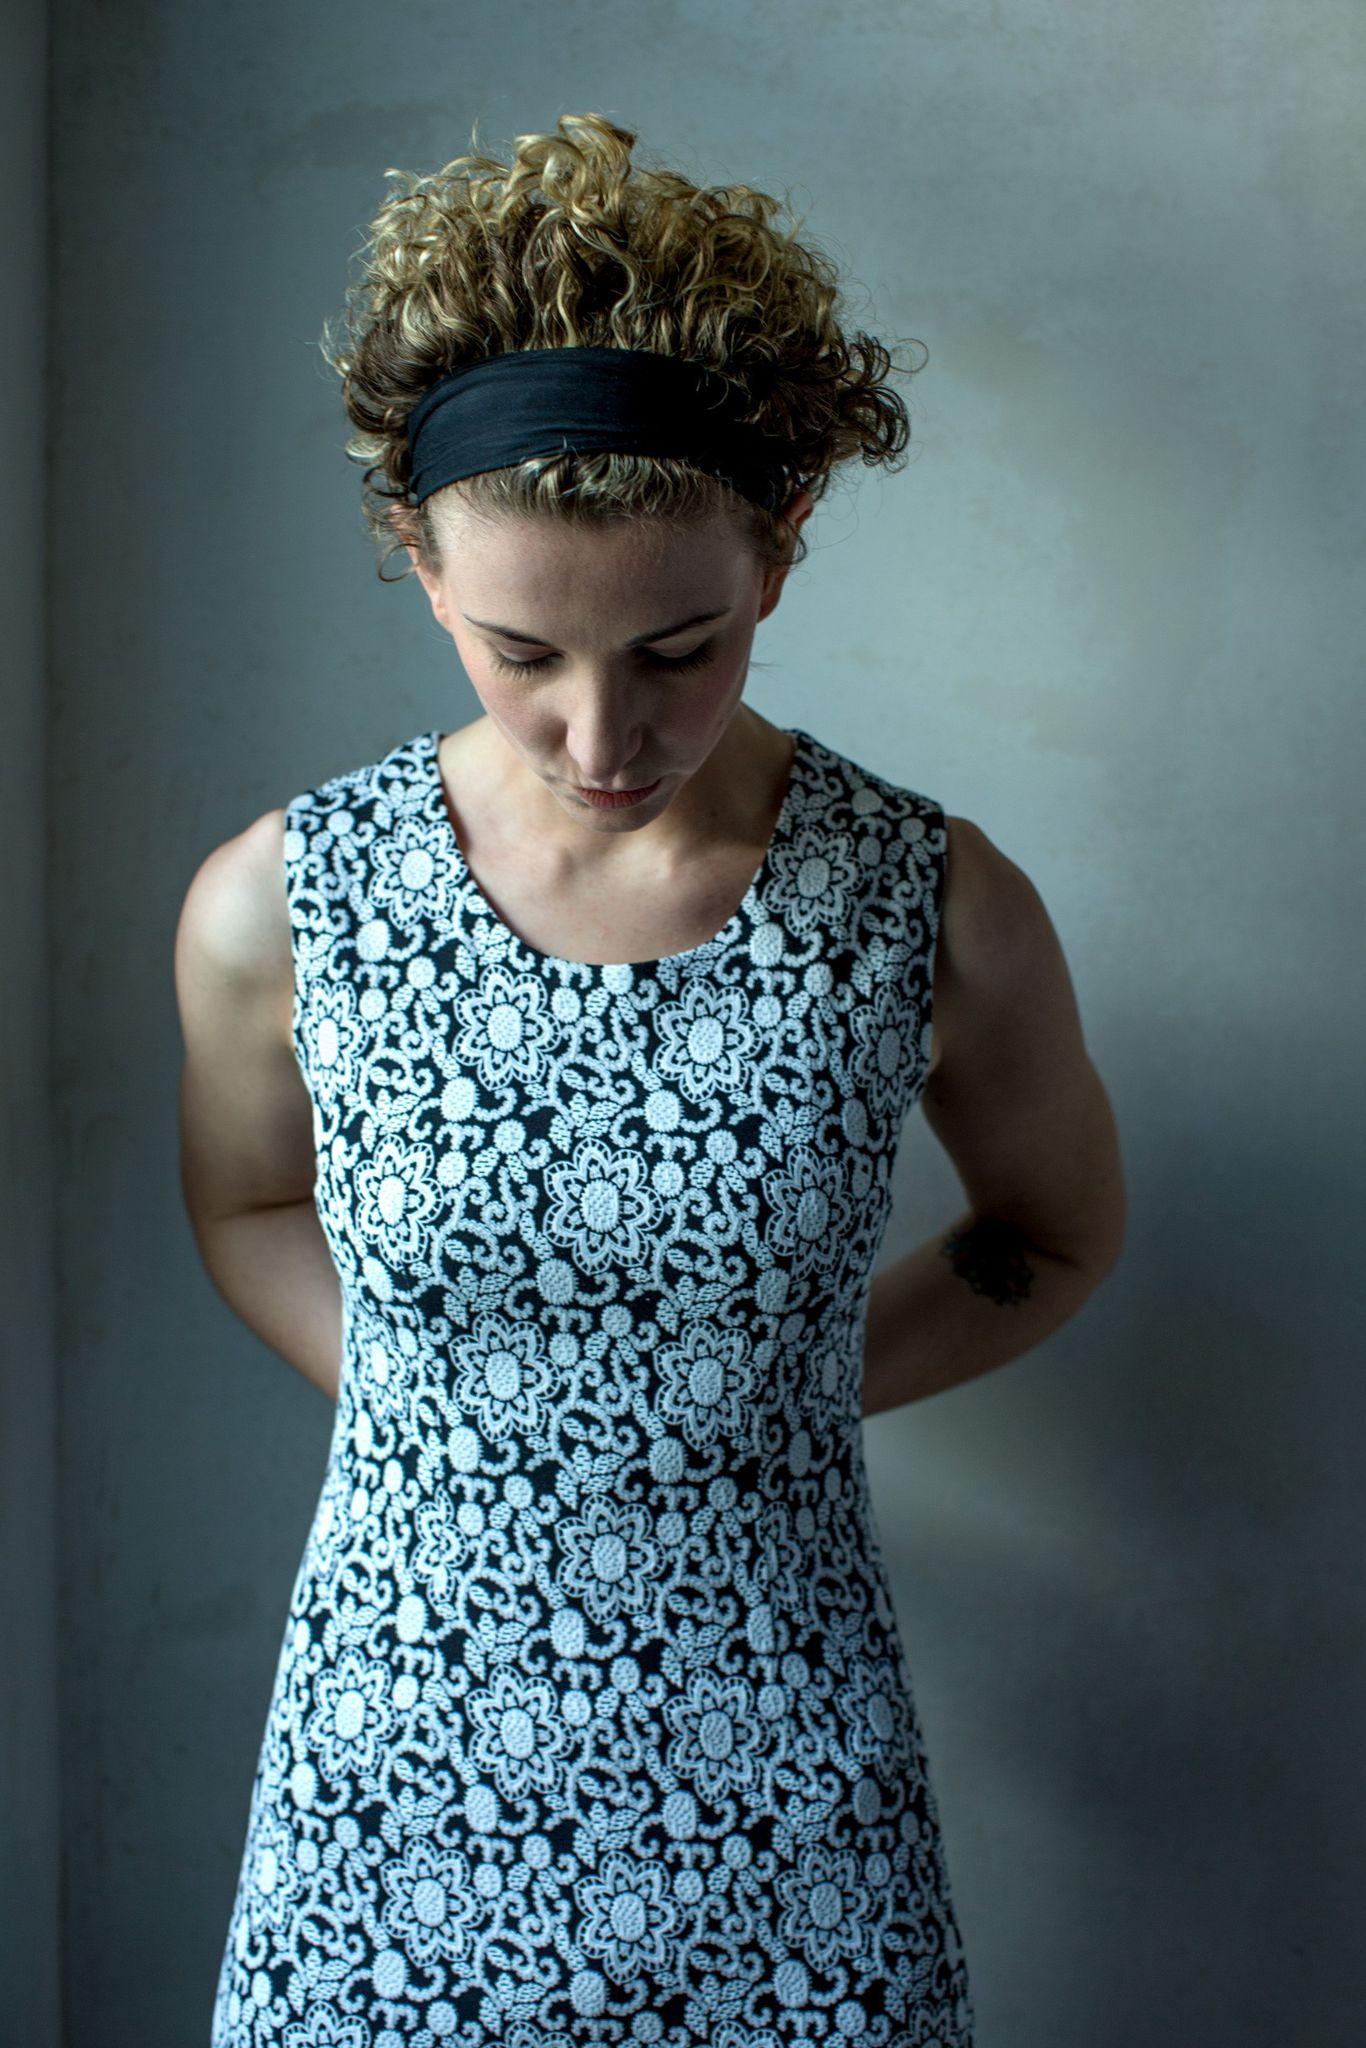 anna_sophie-fritz-_-schauspielerin-_-foto-_darek-gontarski-40artandactors_photography